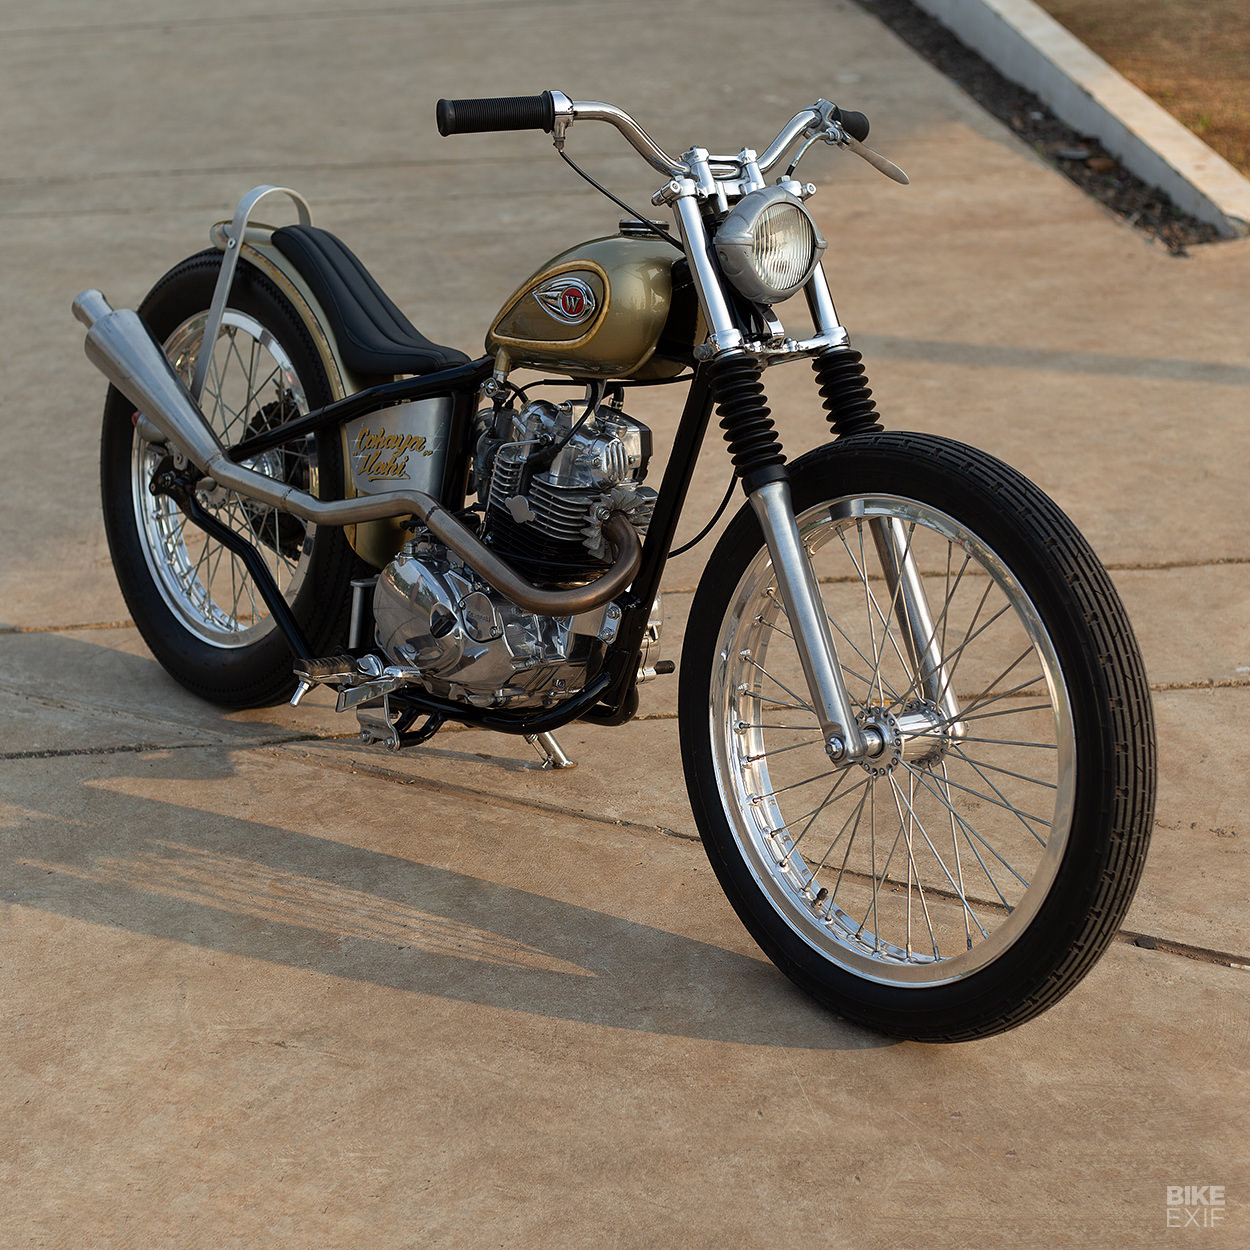 Kawasaki W175 chopper by Tole Motorworks